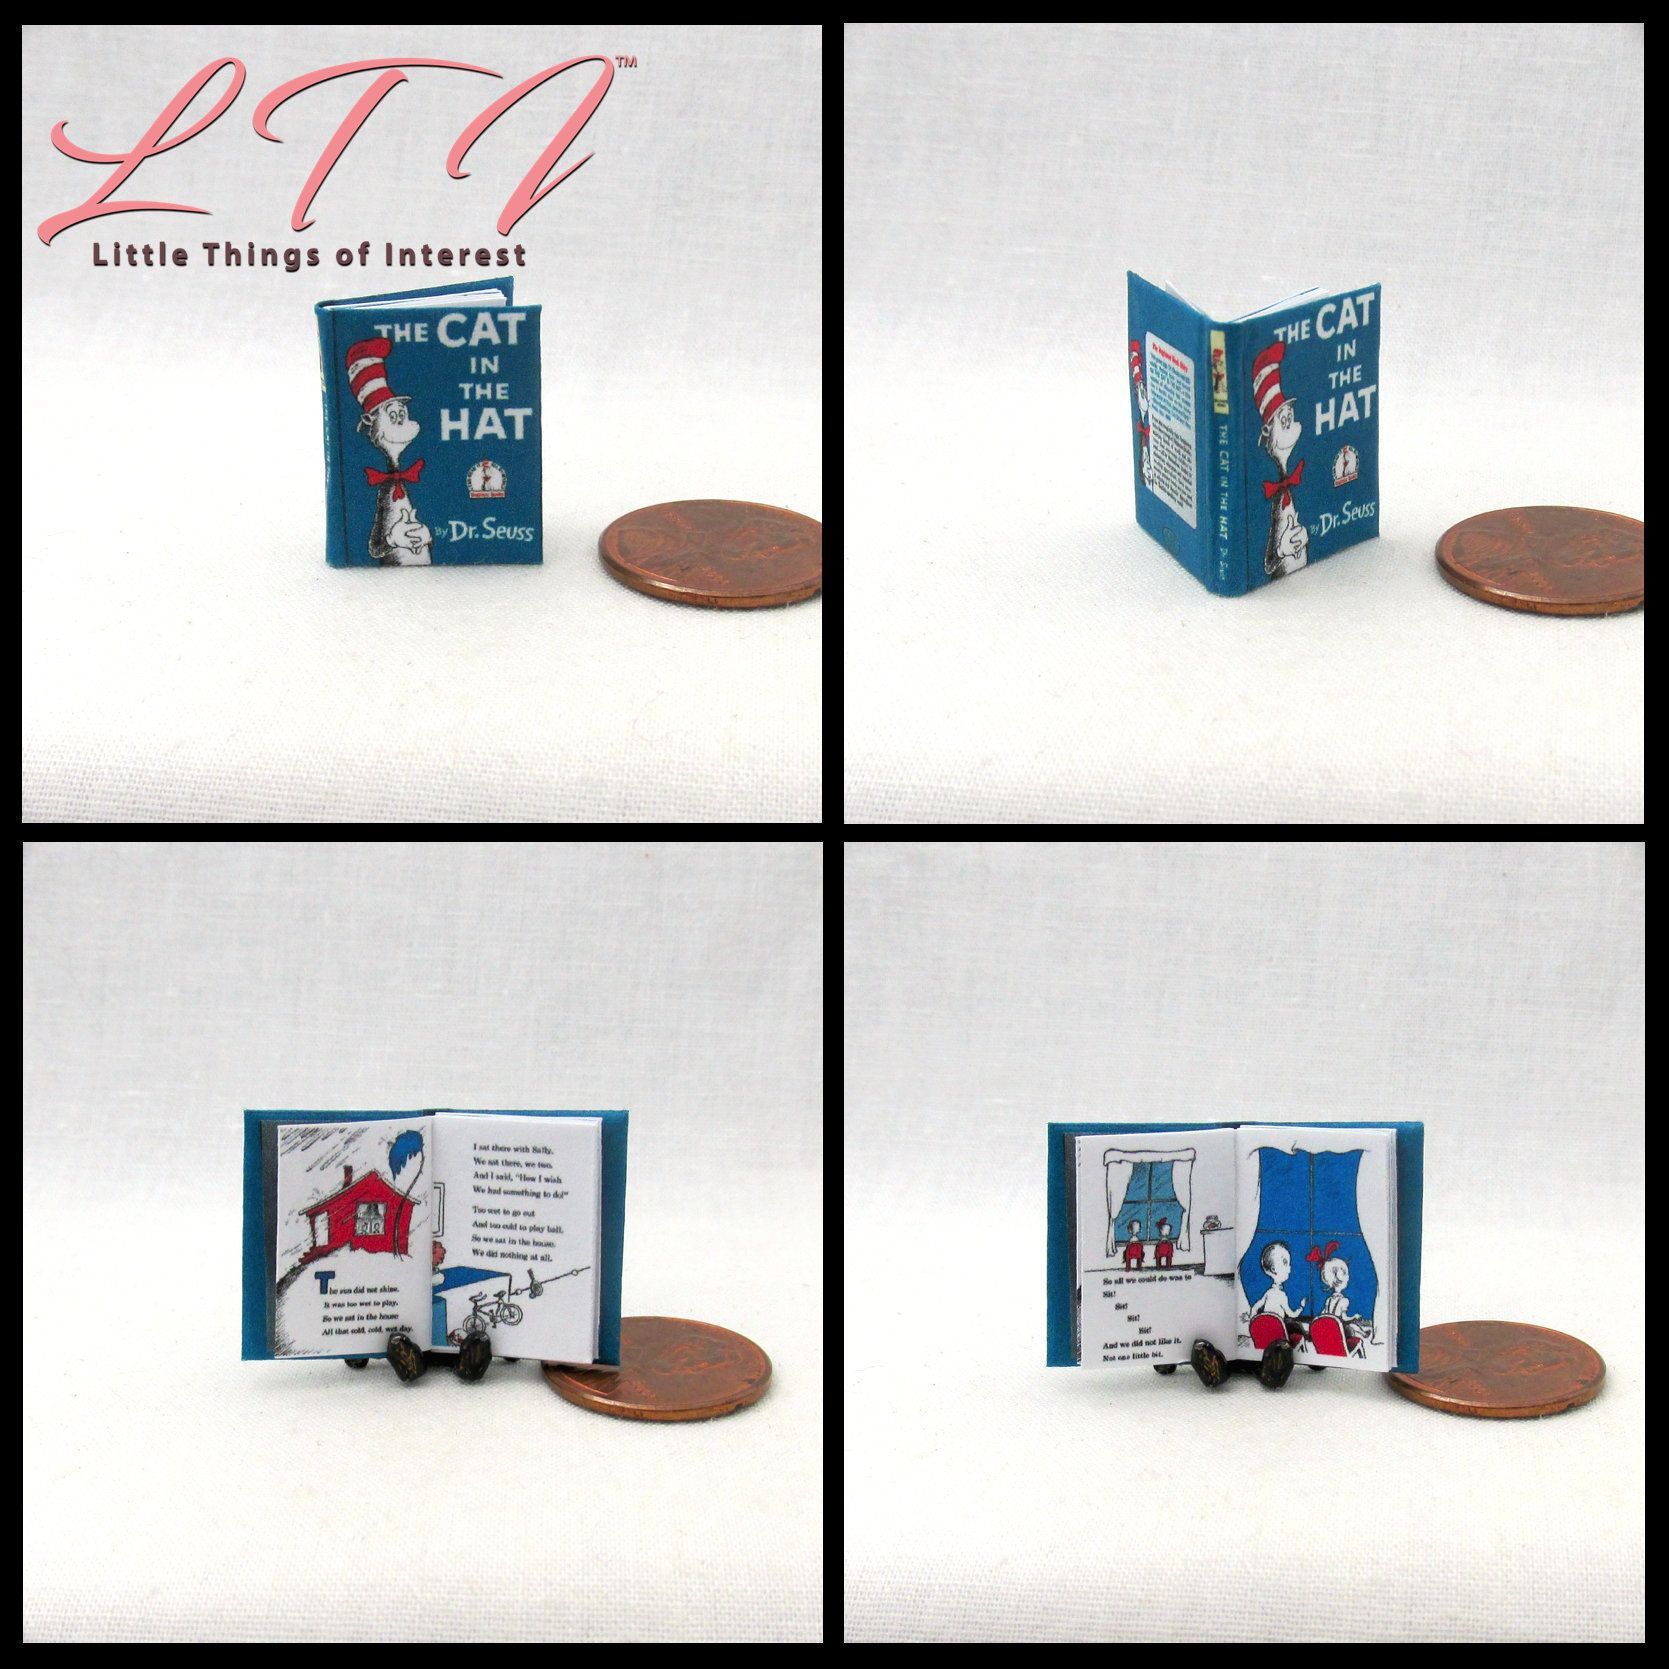 Dr Seuss Cat in the Hat 2   1:12 Scale dollhouse miniature books